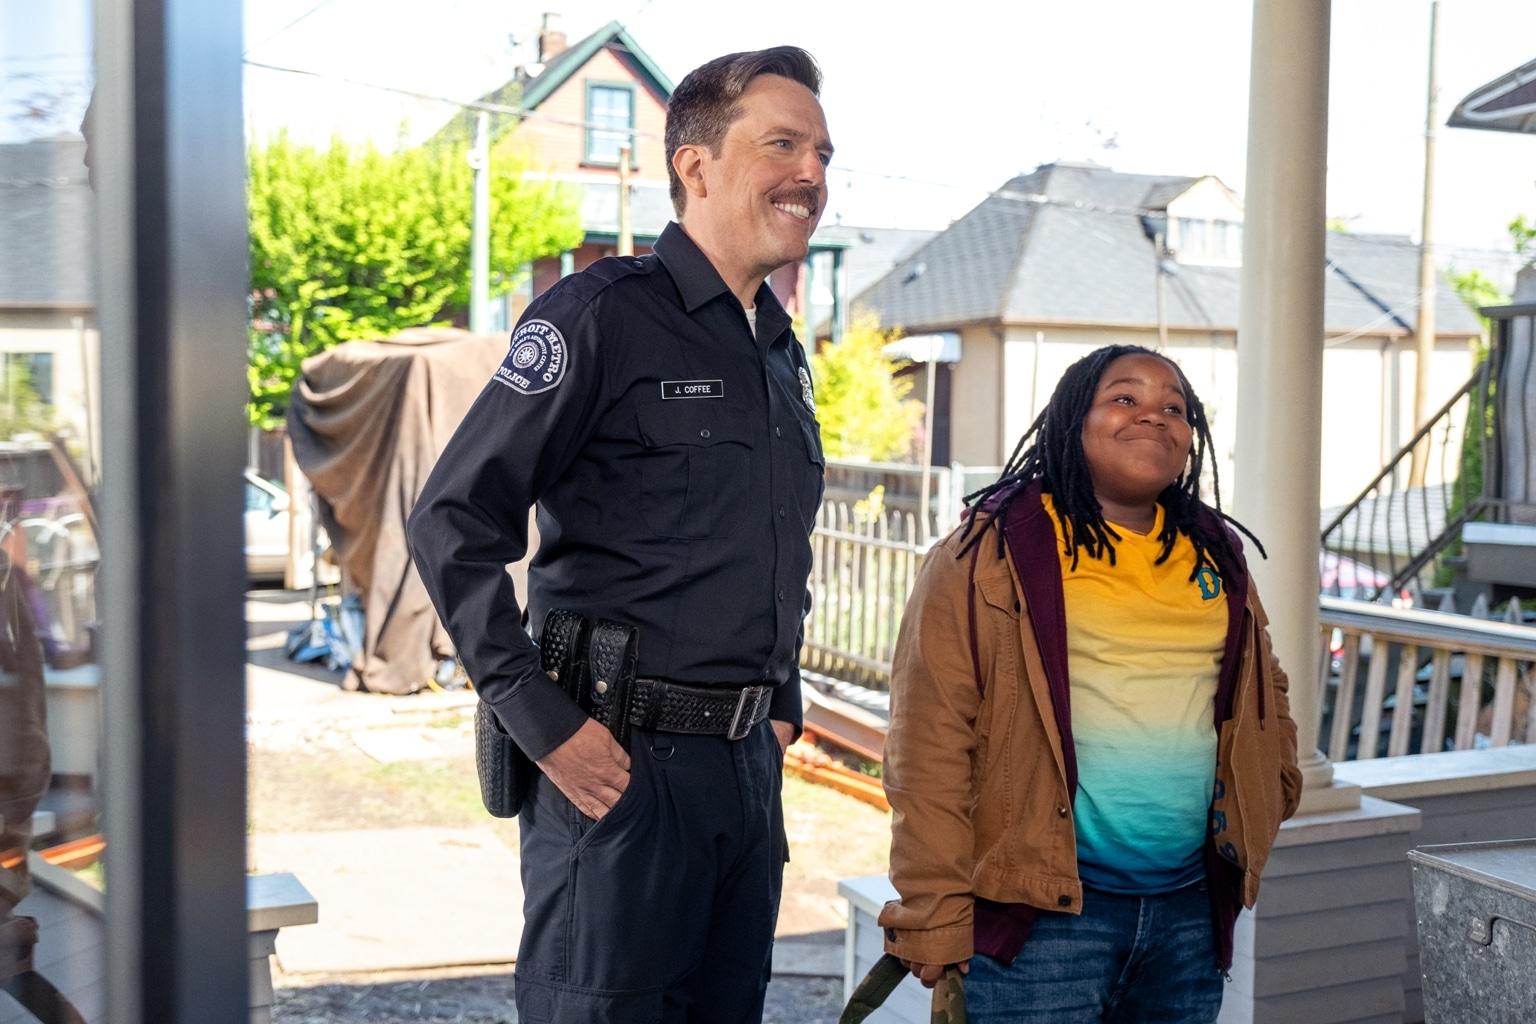 New on Netflix in April: Money Heist Part 4, Last Kingdom Season 4, Nailed It Season 4, & more 15